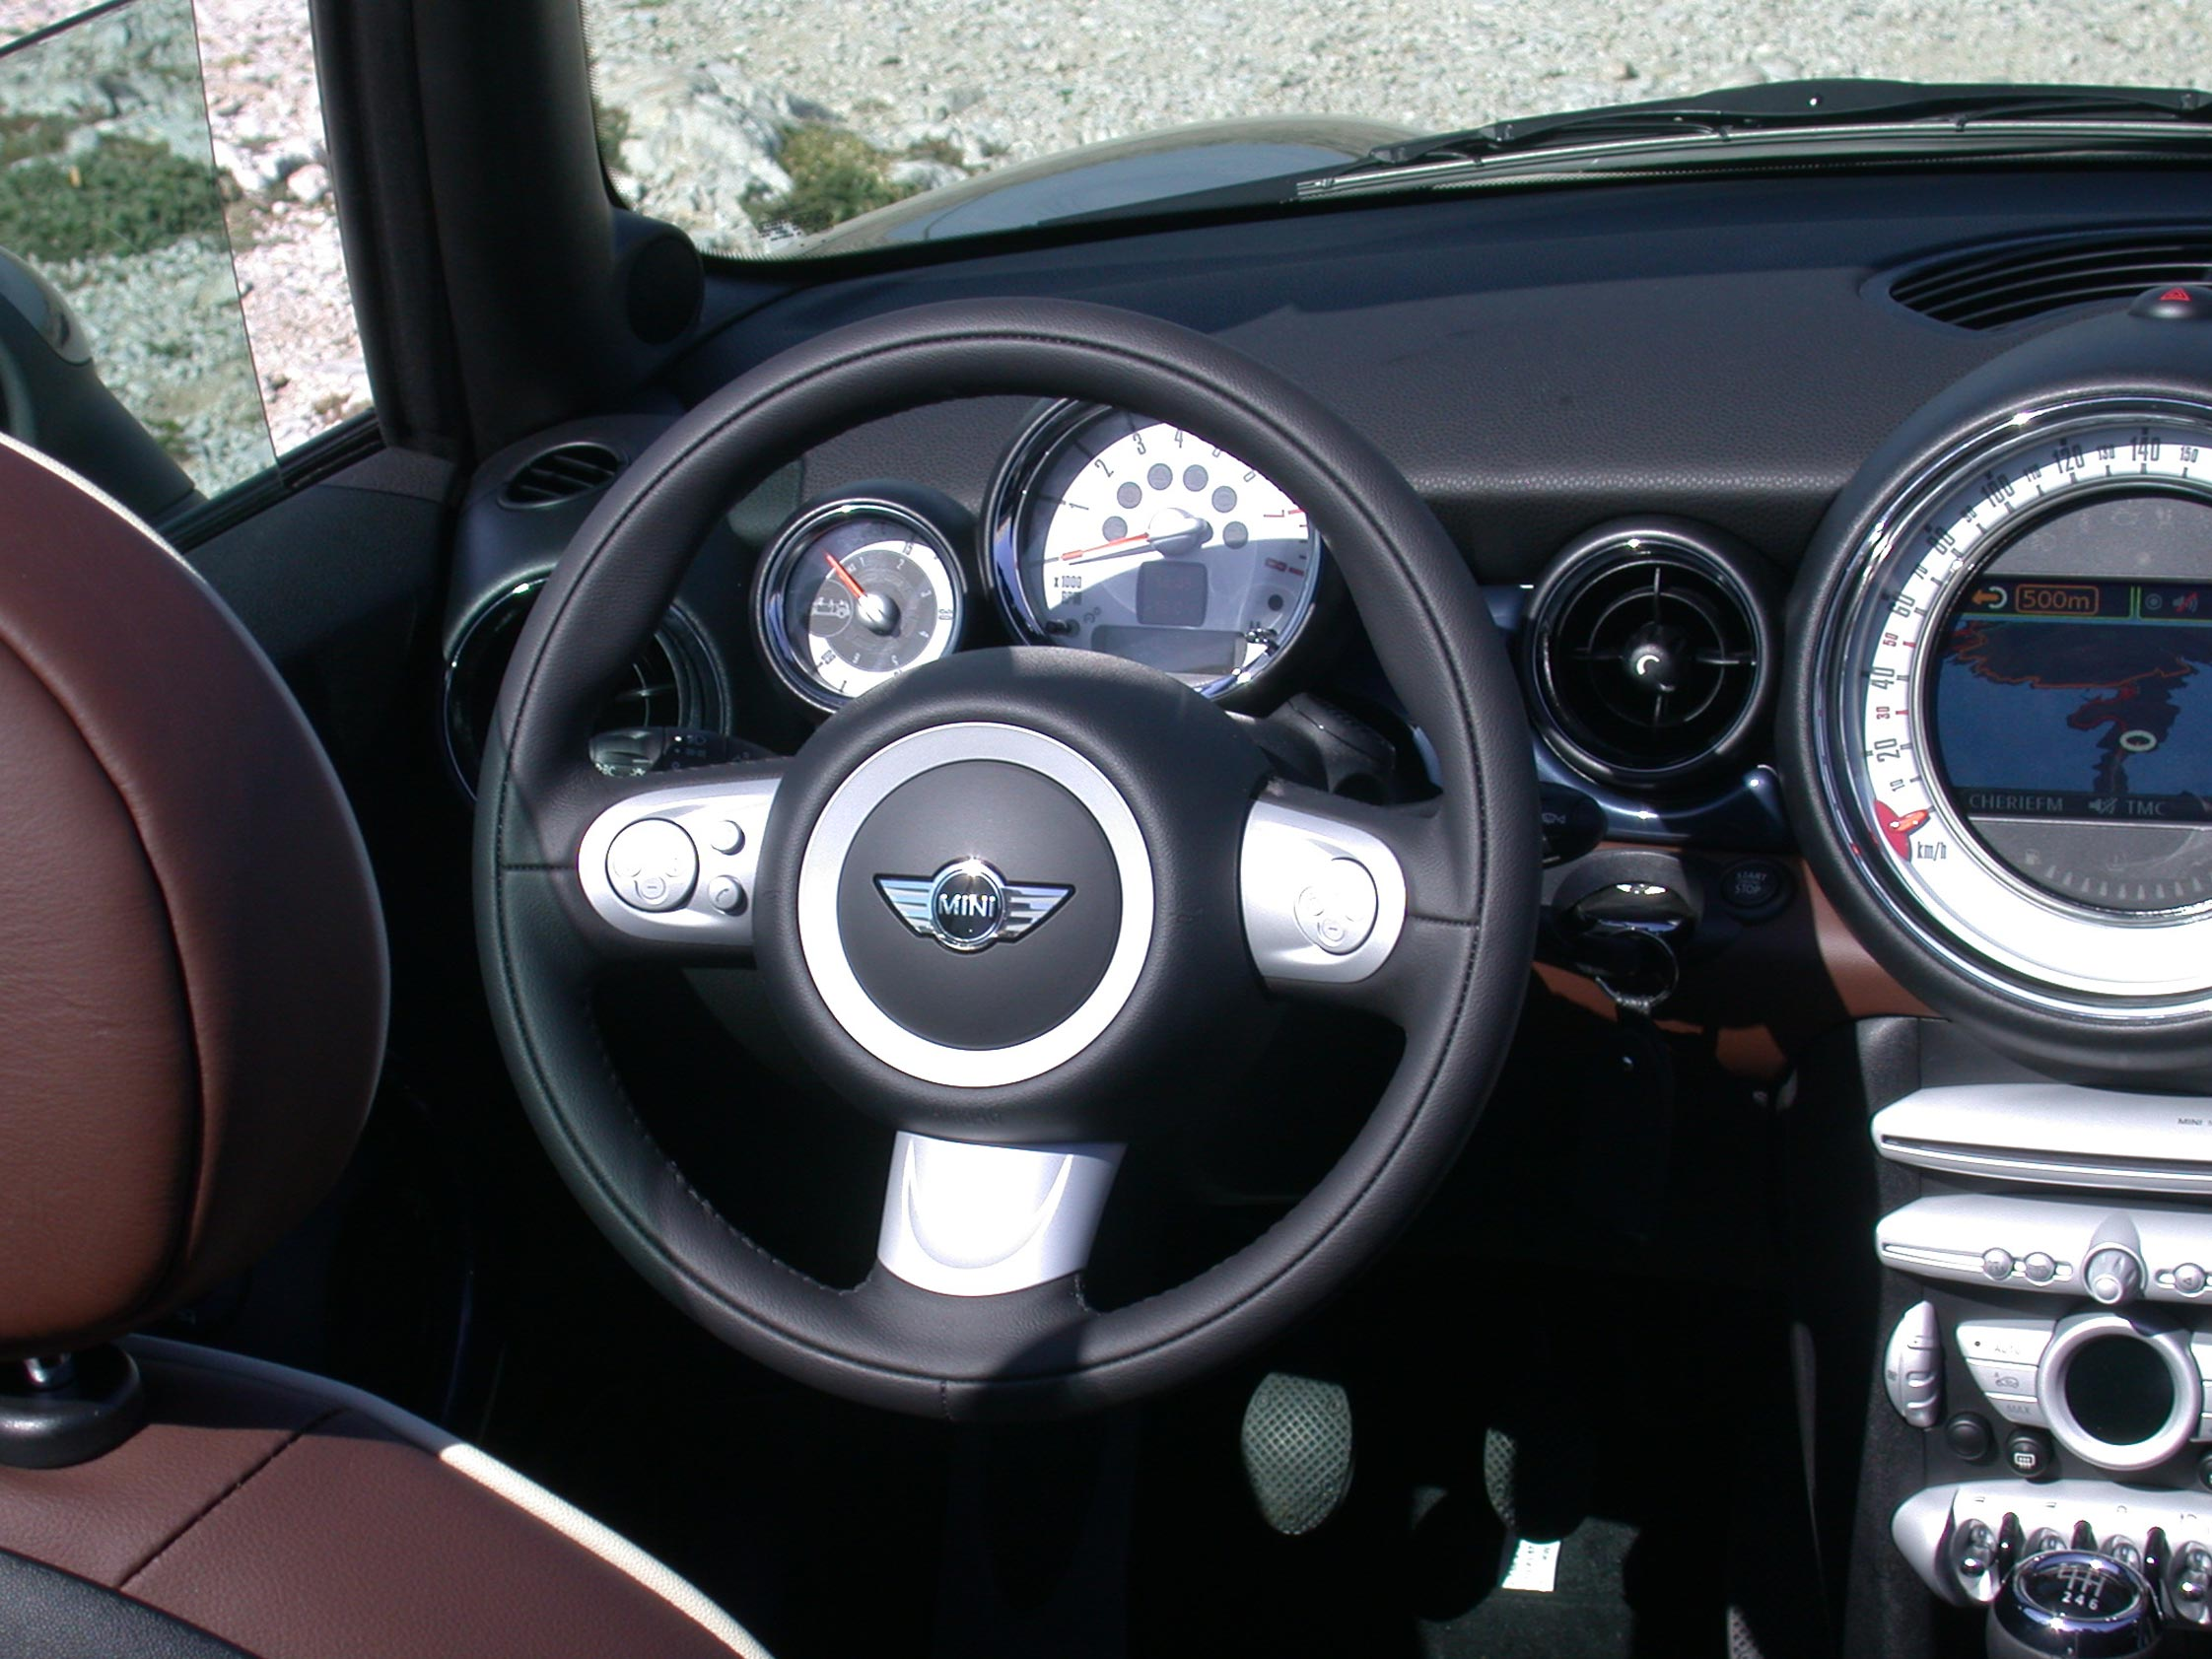 essai mini cooper cabrio 2009 motorlegend. Black Bedroom Furniture Sets. Home Design Ideas